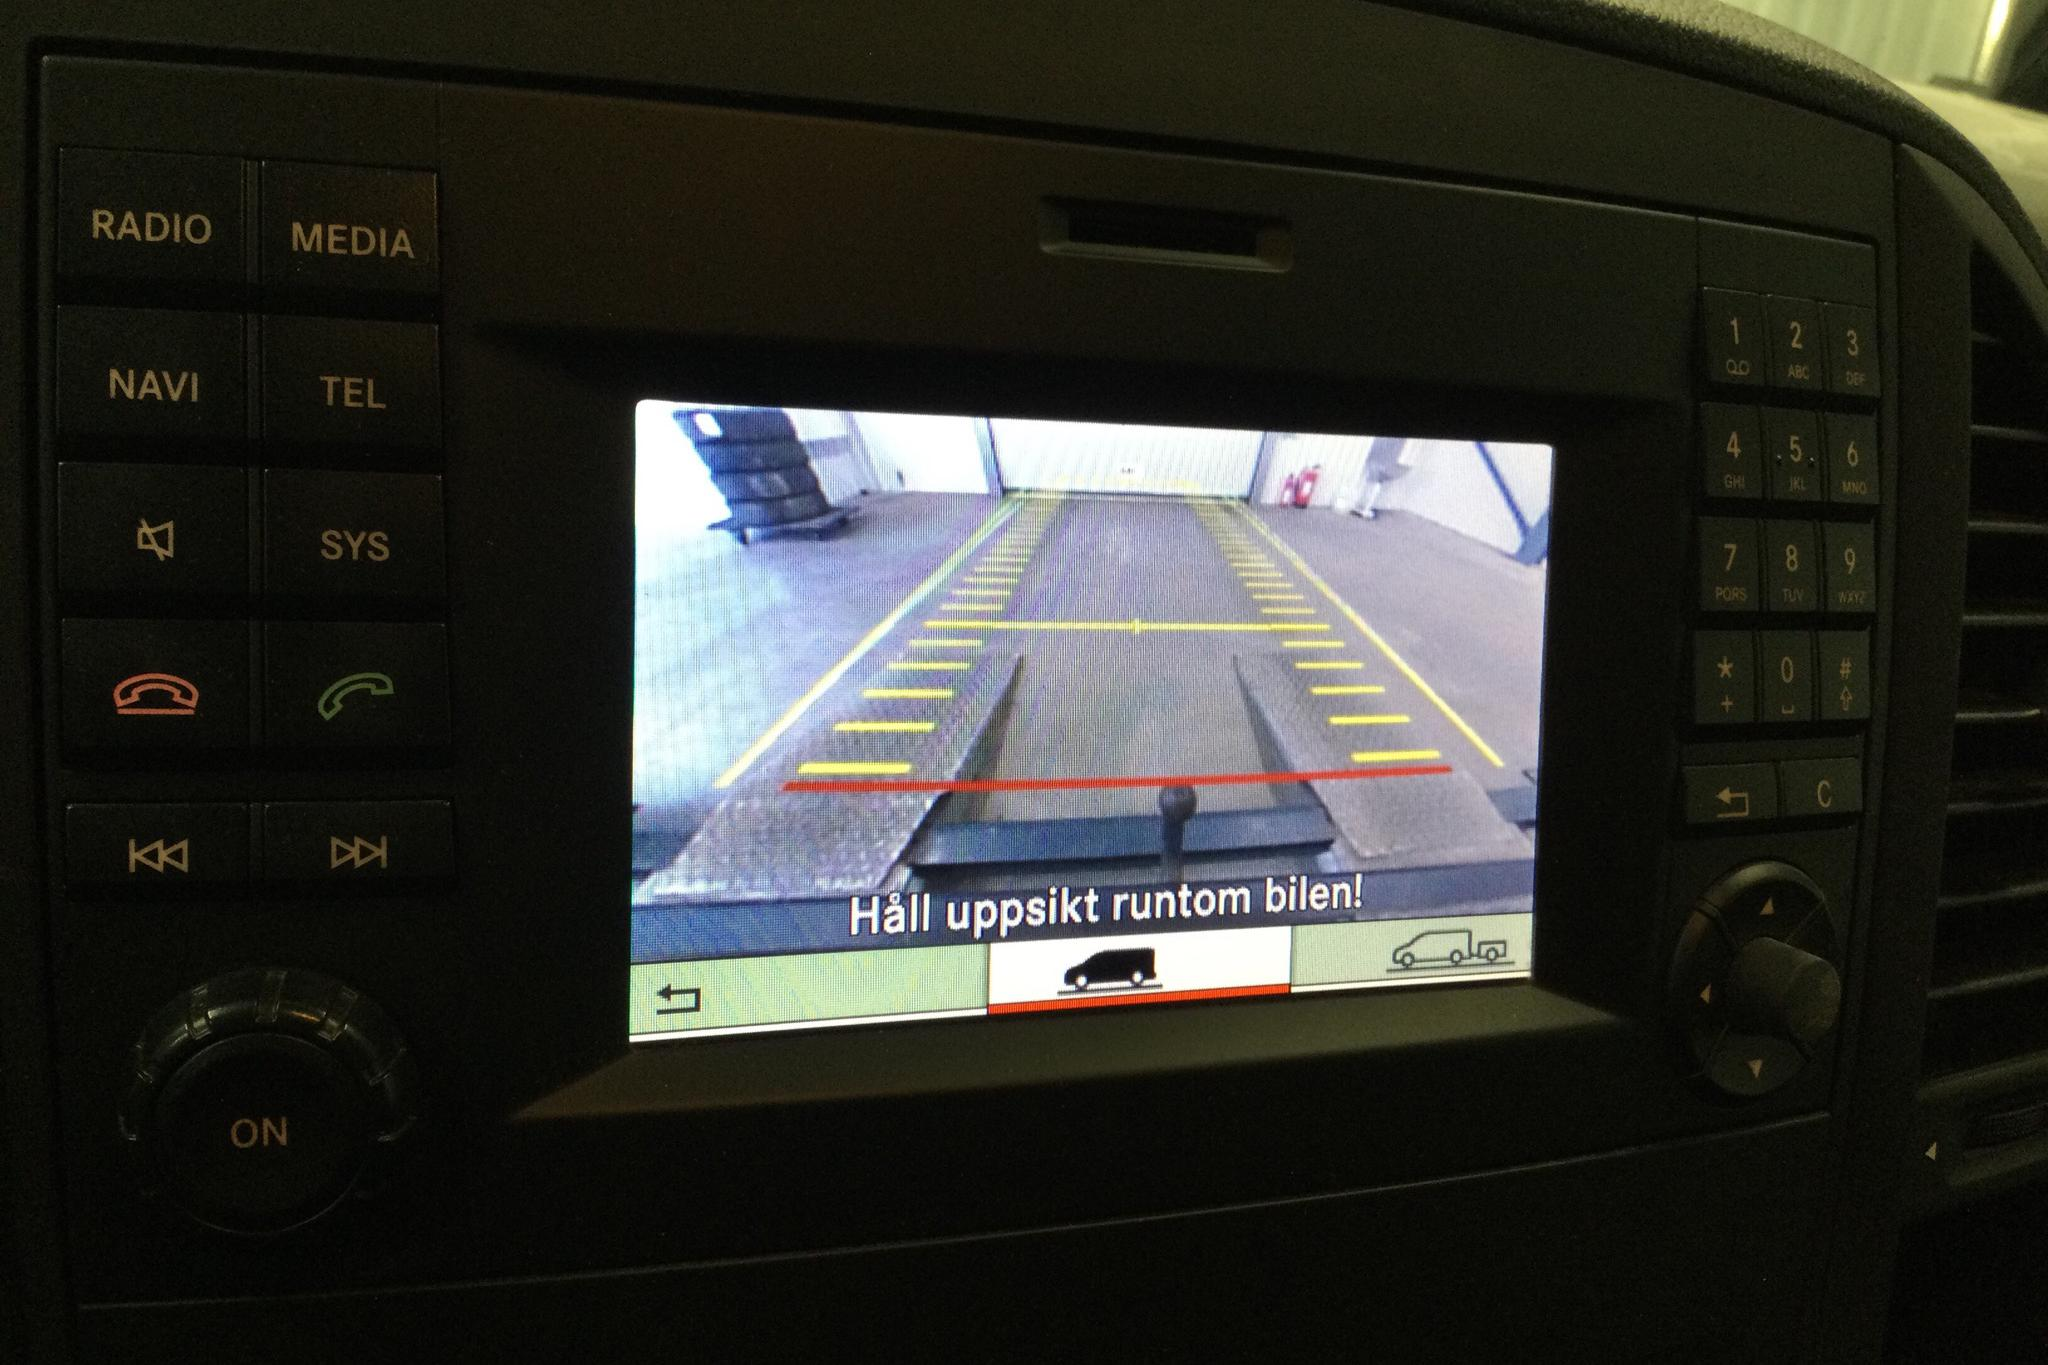 Mercedes Vito 114 CDI W640 (136hk) - 7 735 mil - Automat - svart - 2016